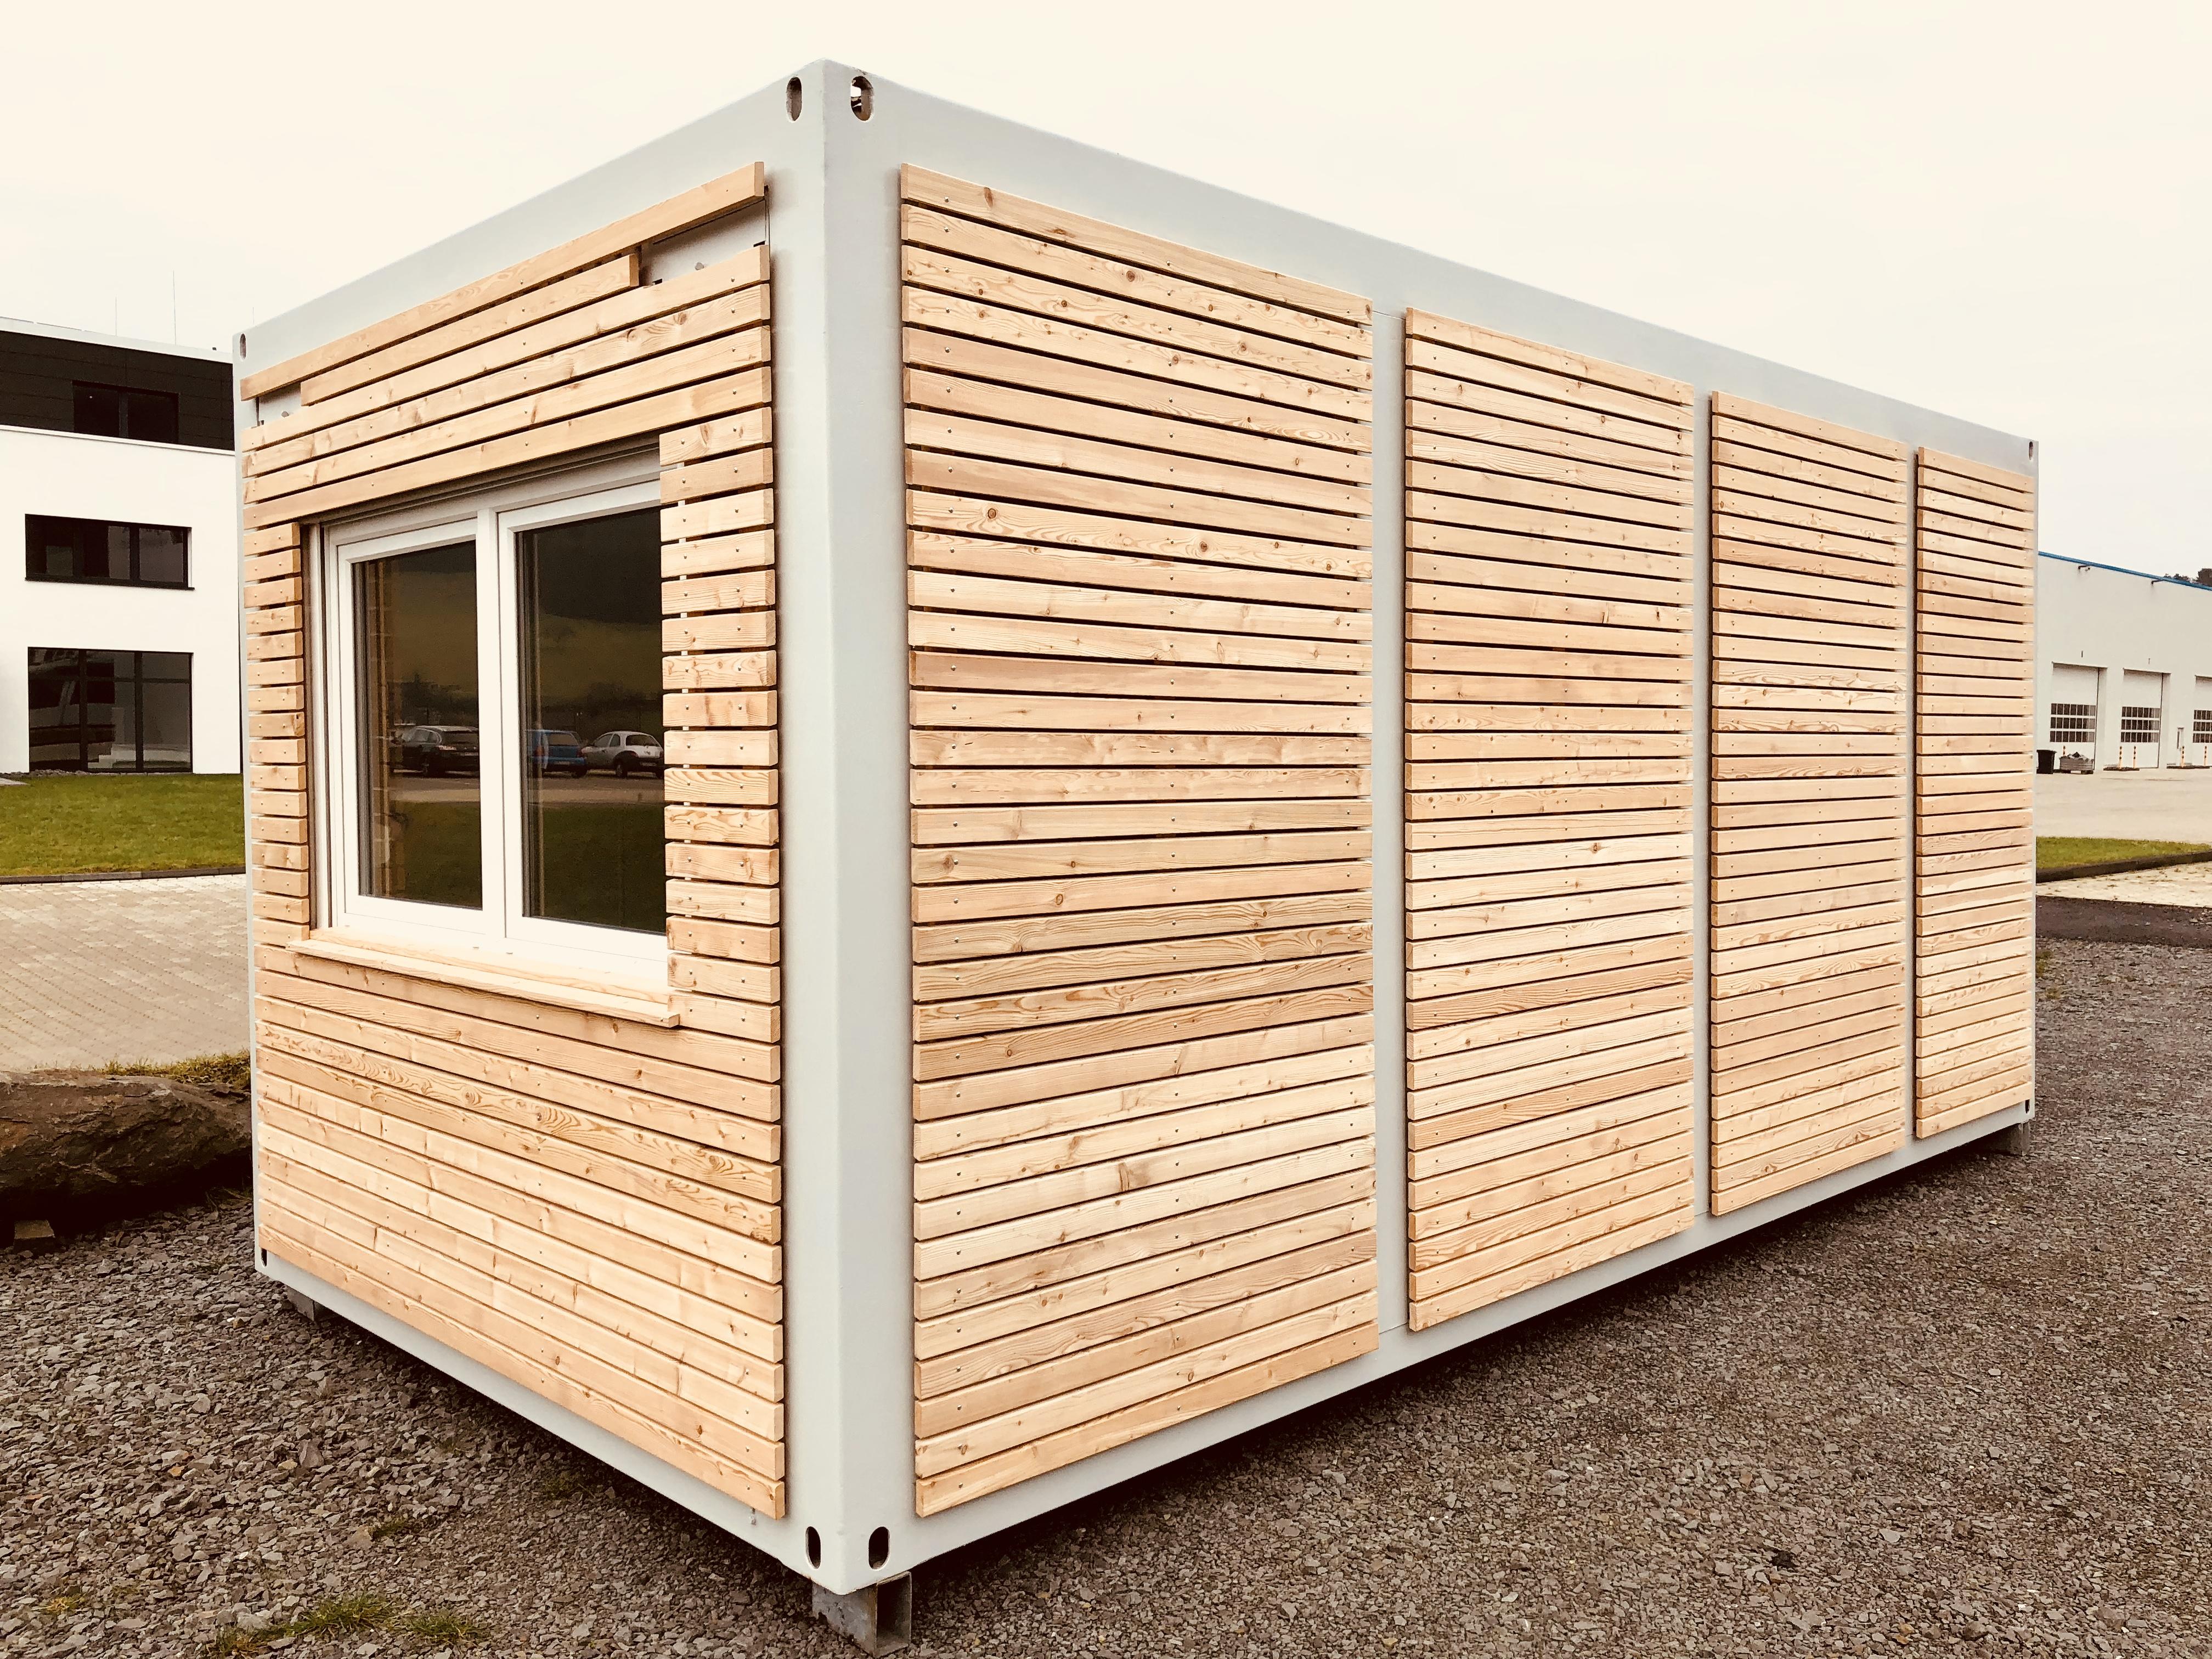 Berühmt Rhombusprofile Container Fassaden – OPTIRENT Mobilraum-Mietservice DM44